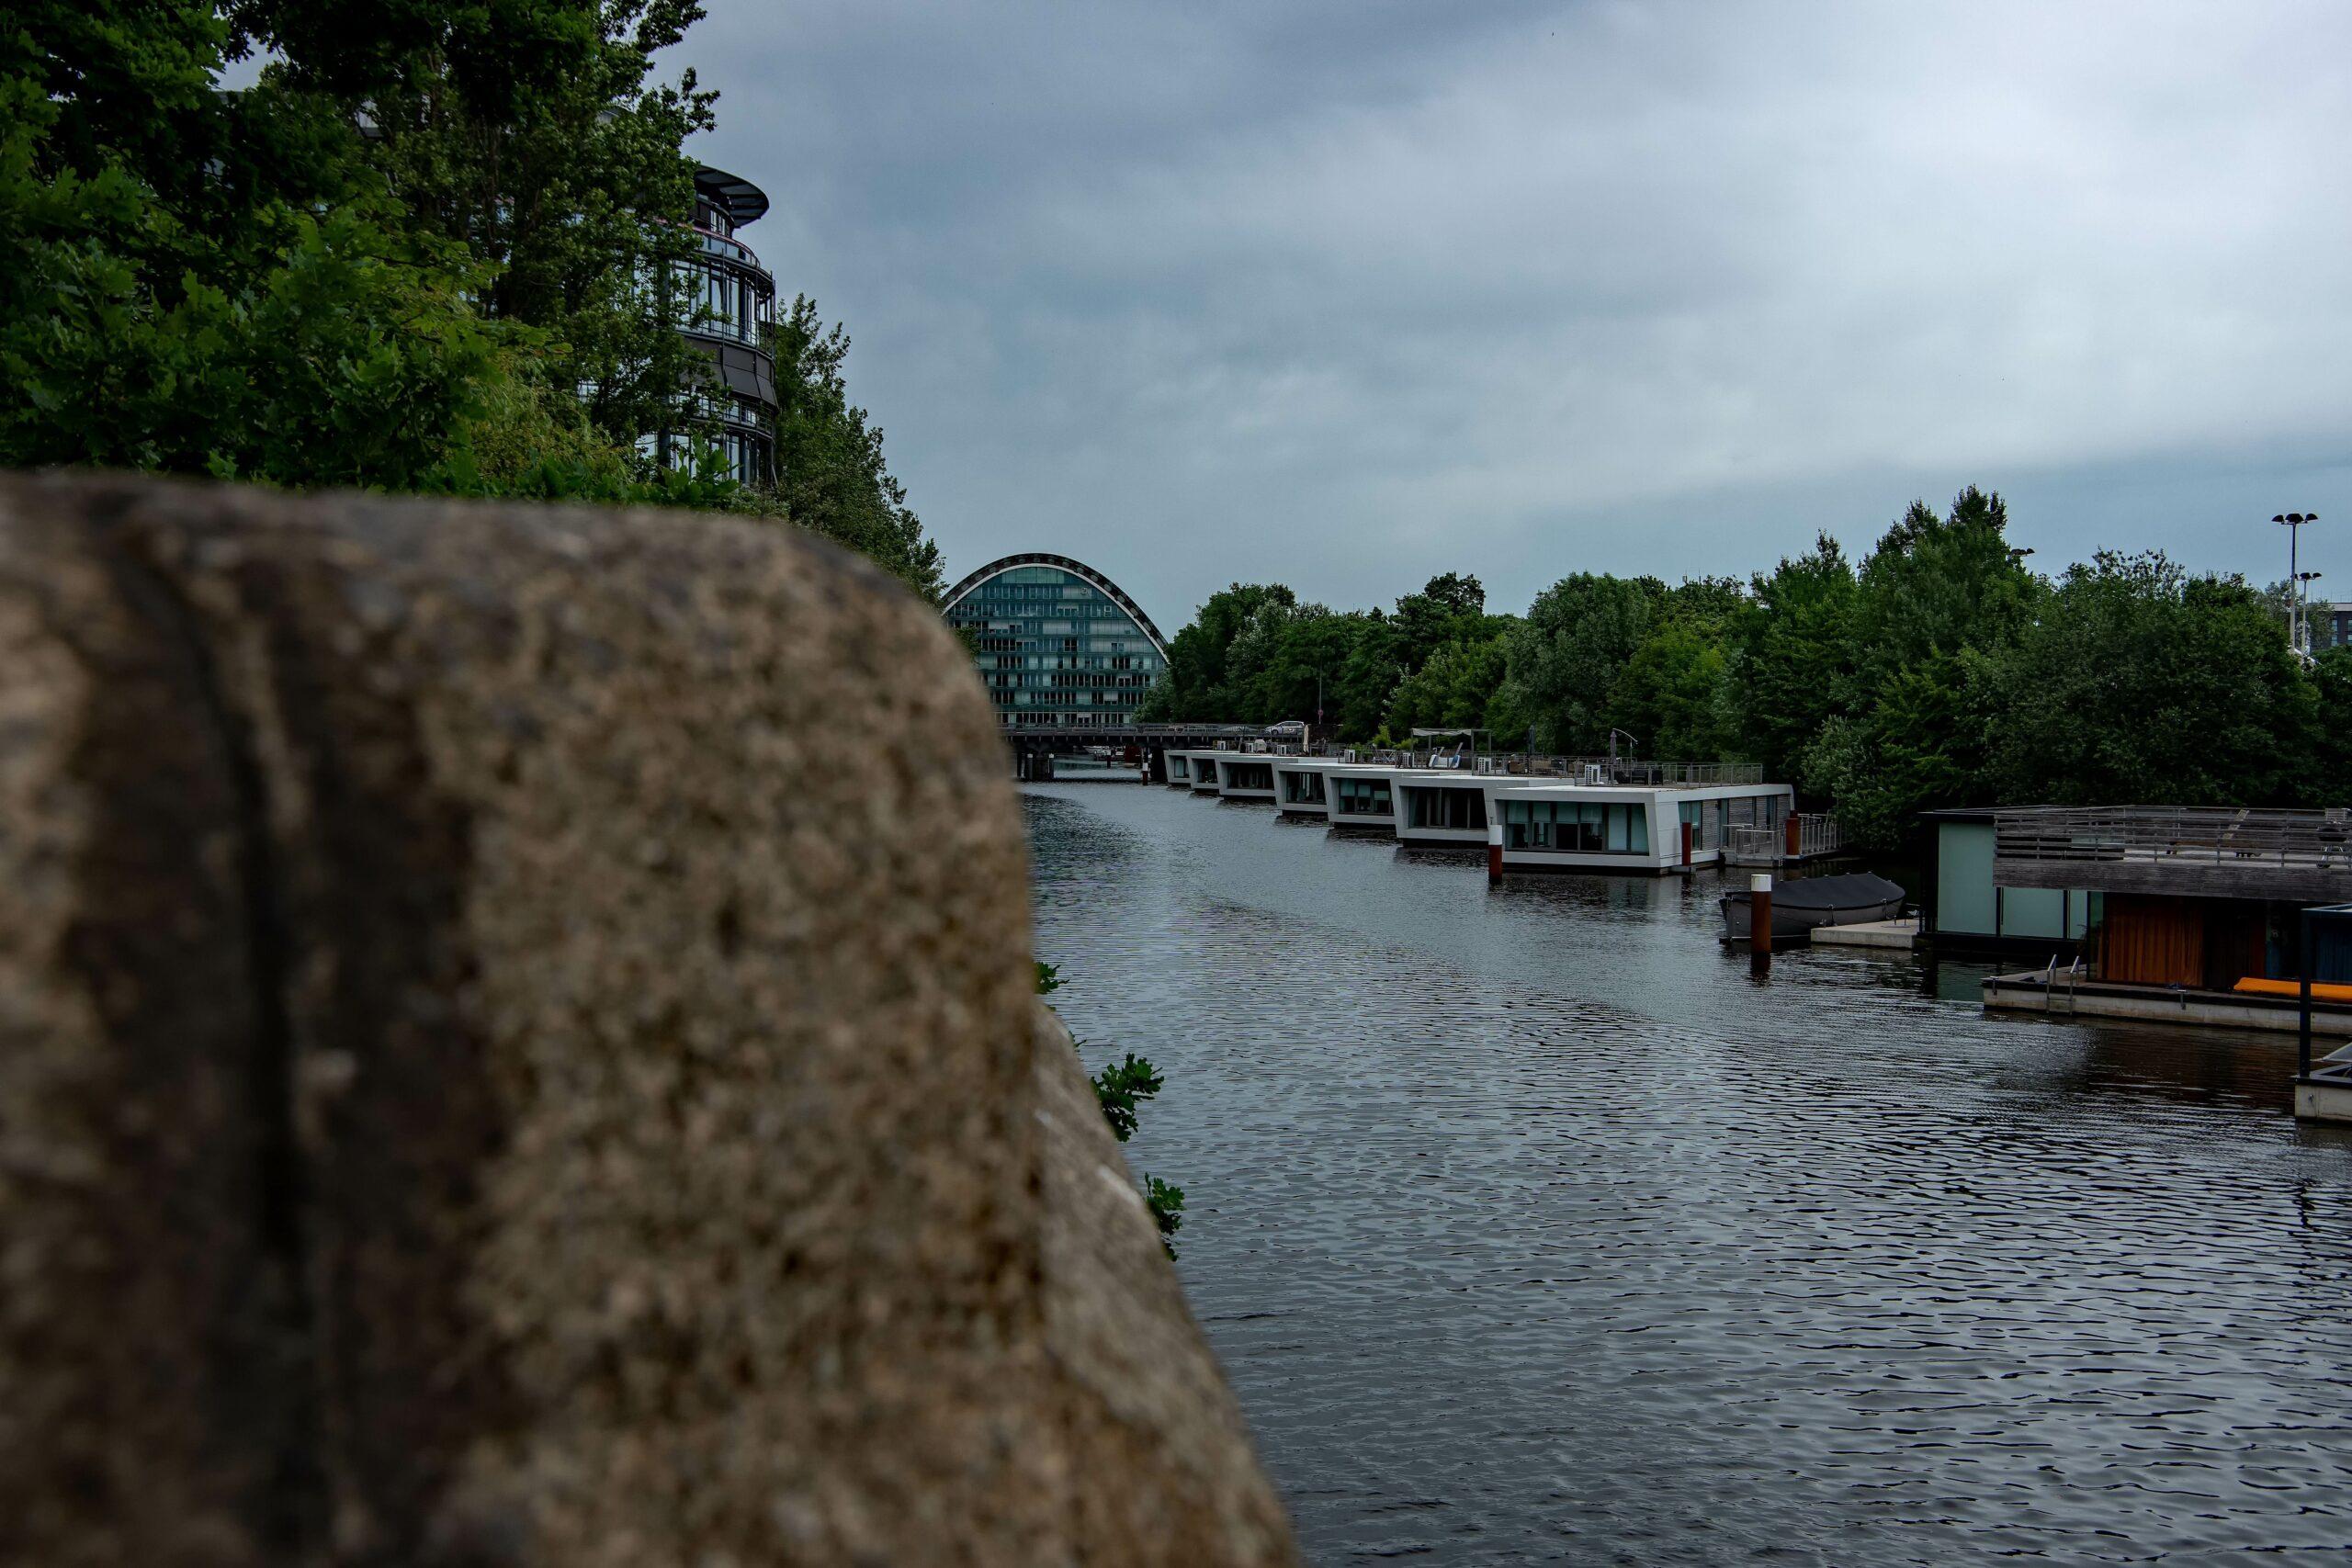 Hans Stötera - Dienstagtour 06.07.2021 - Hausbootkanal